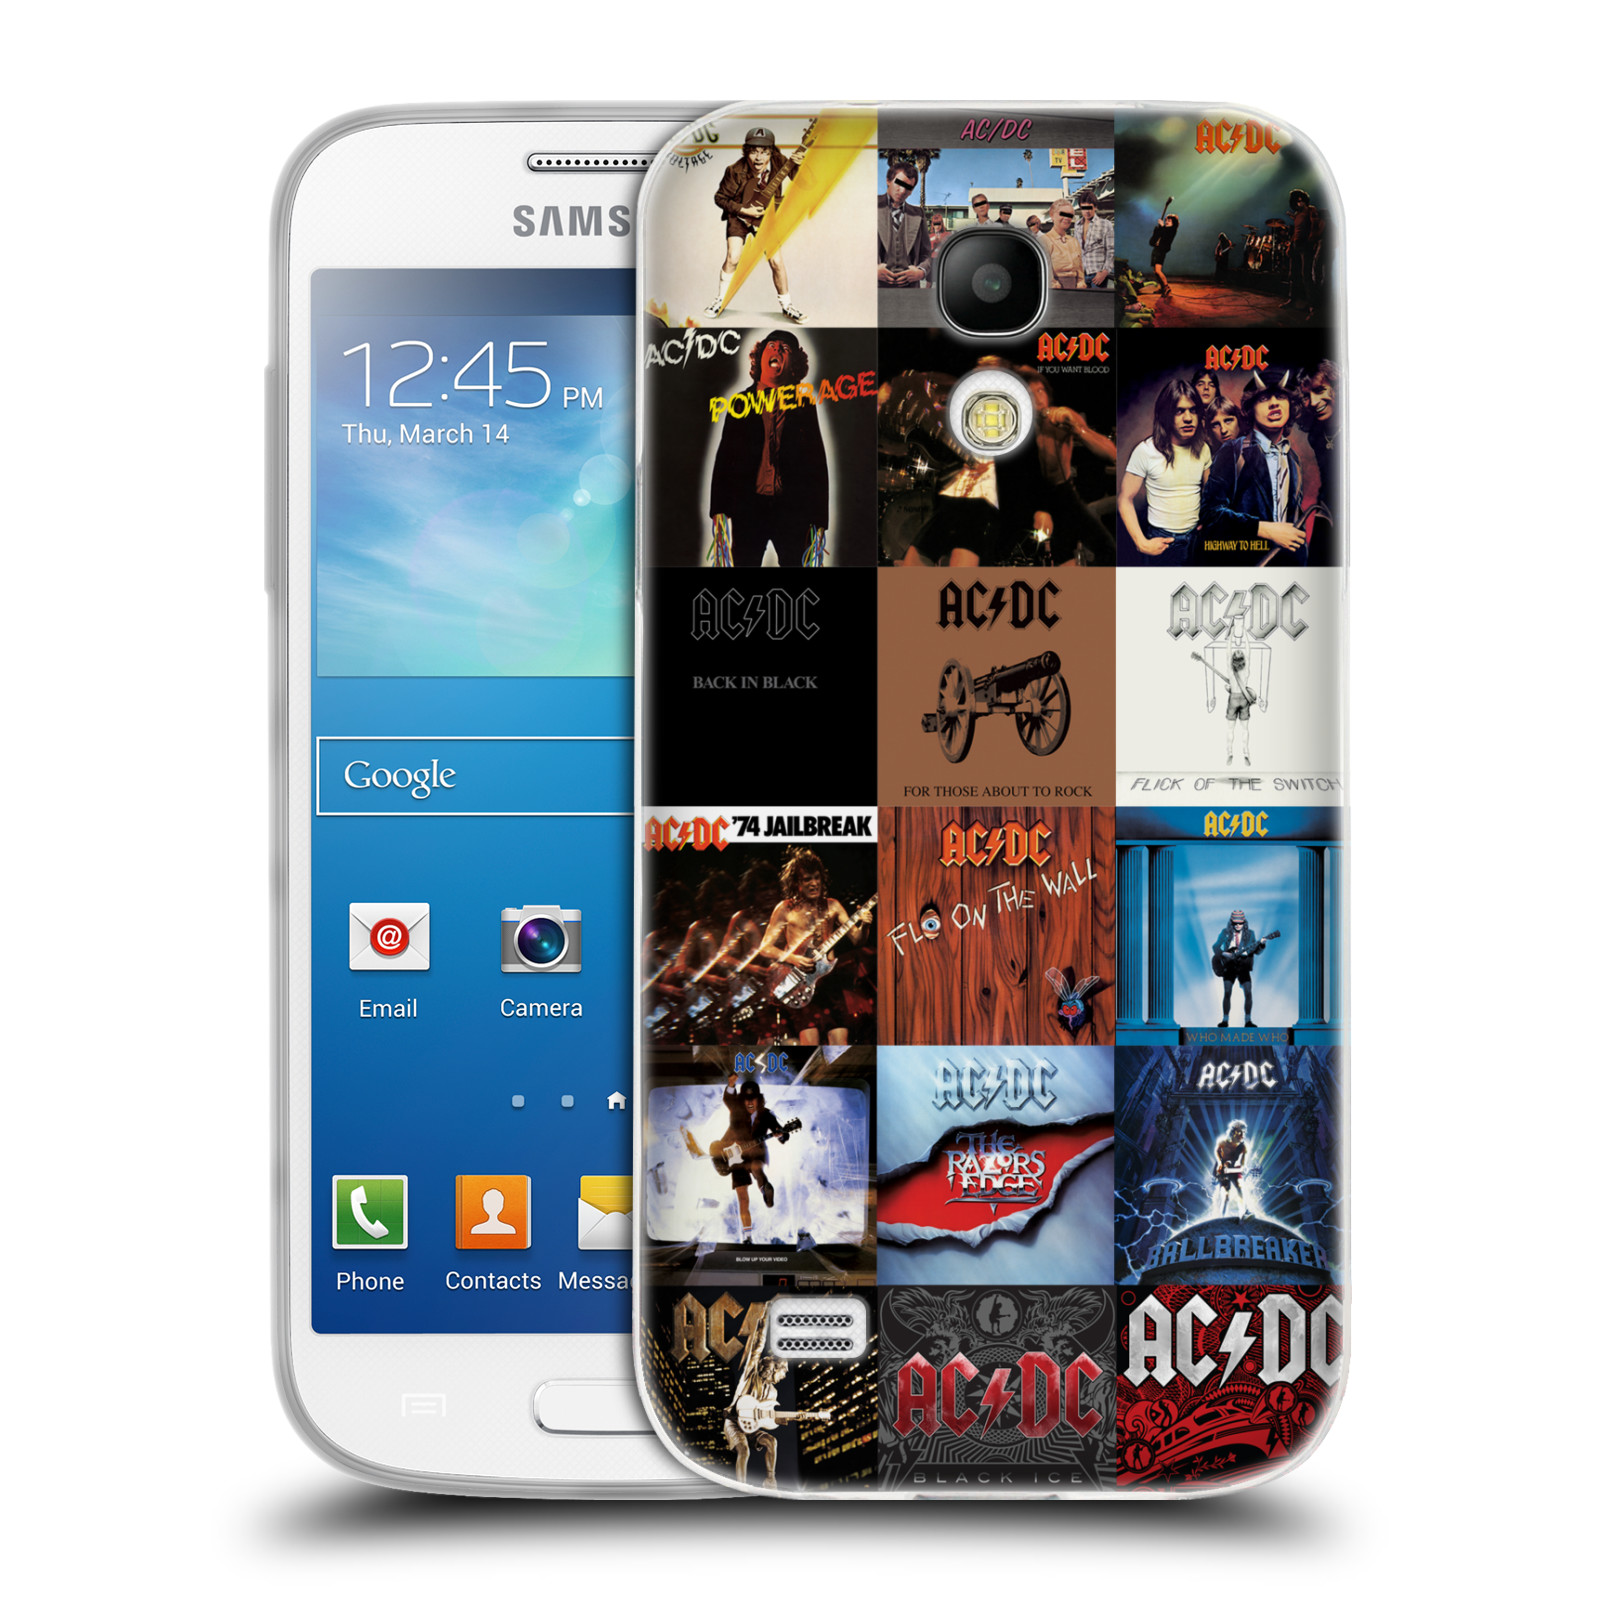 HEAD CASE silikonový obal na mobil Samsung Galaxy S4 MINI rocková skupina ACDC seznam alba